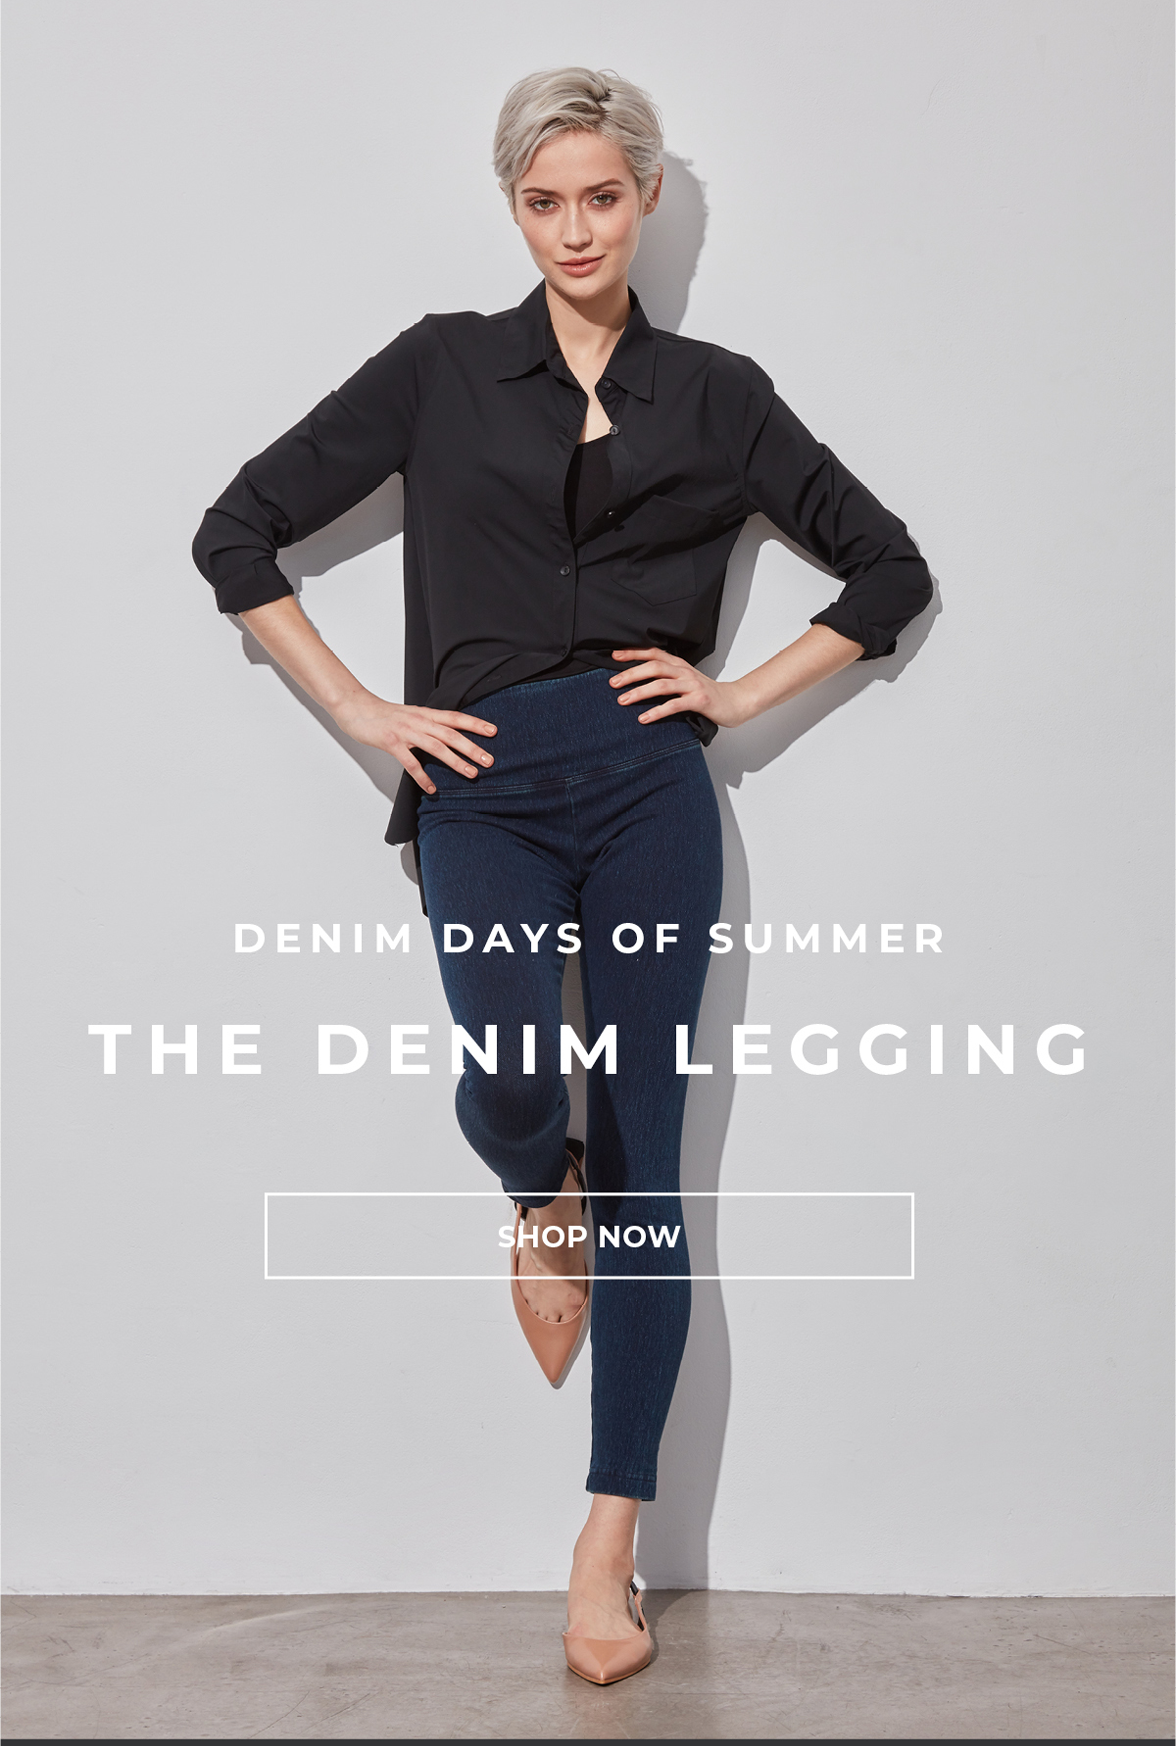 denim days of summer - The Denim legging